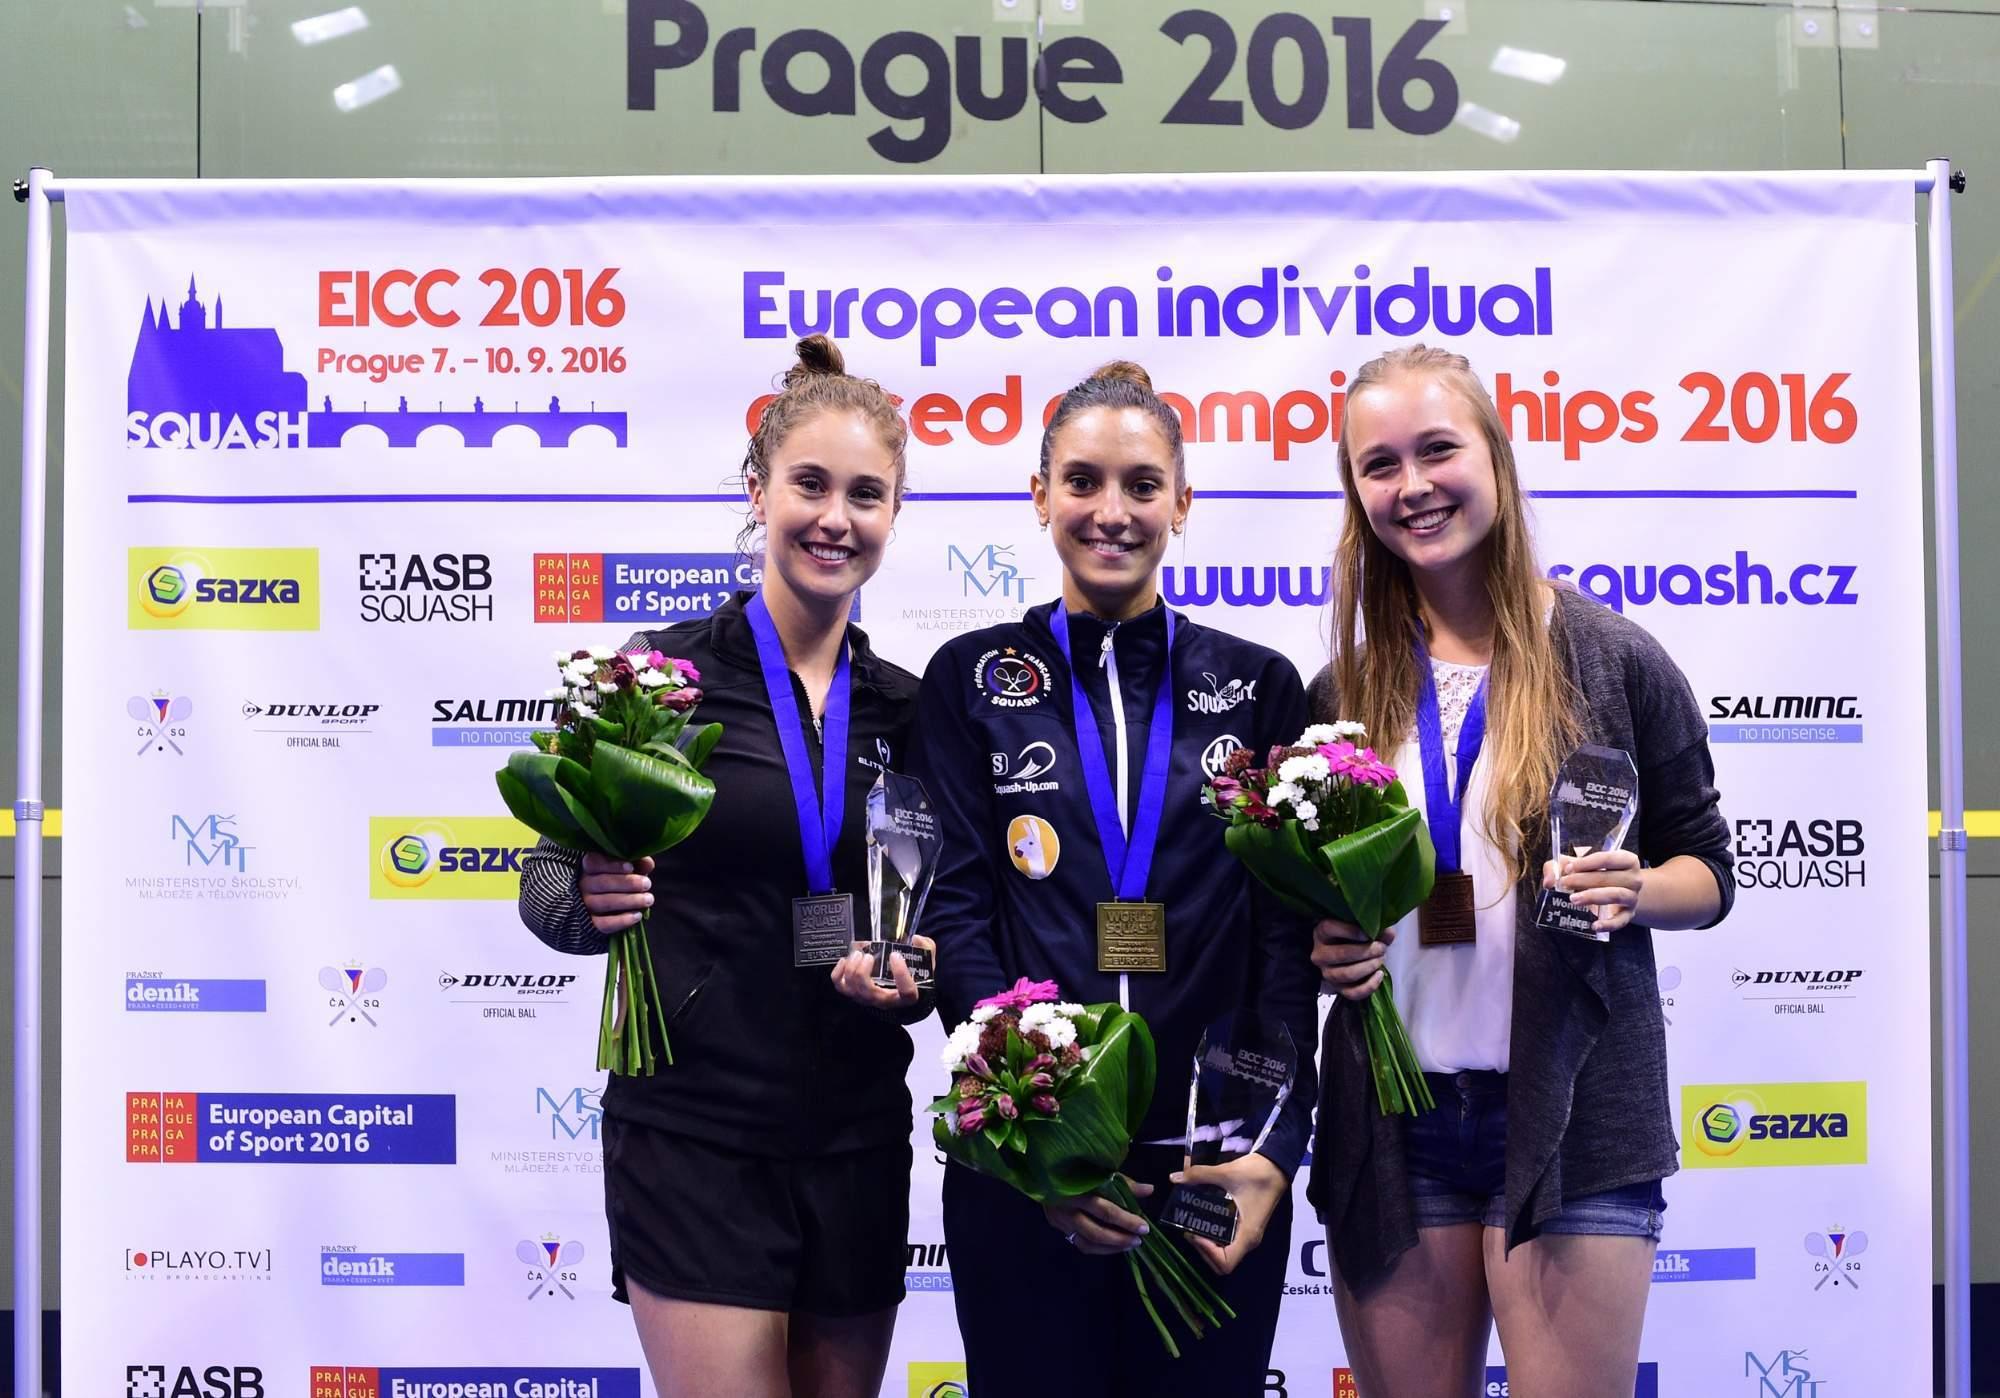 eicc2016 zmagovalke